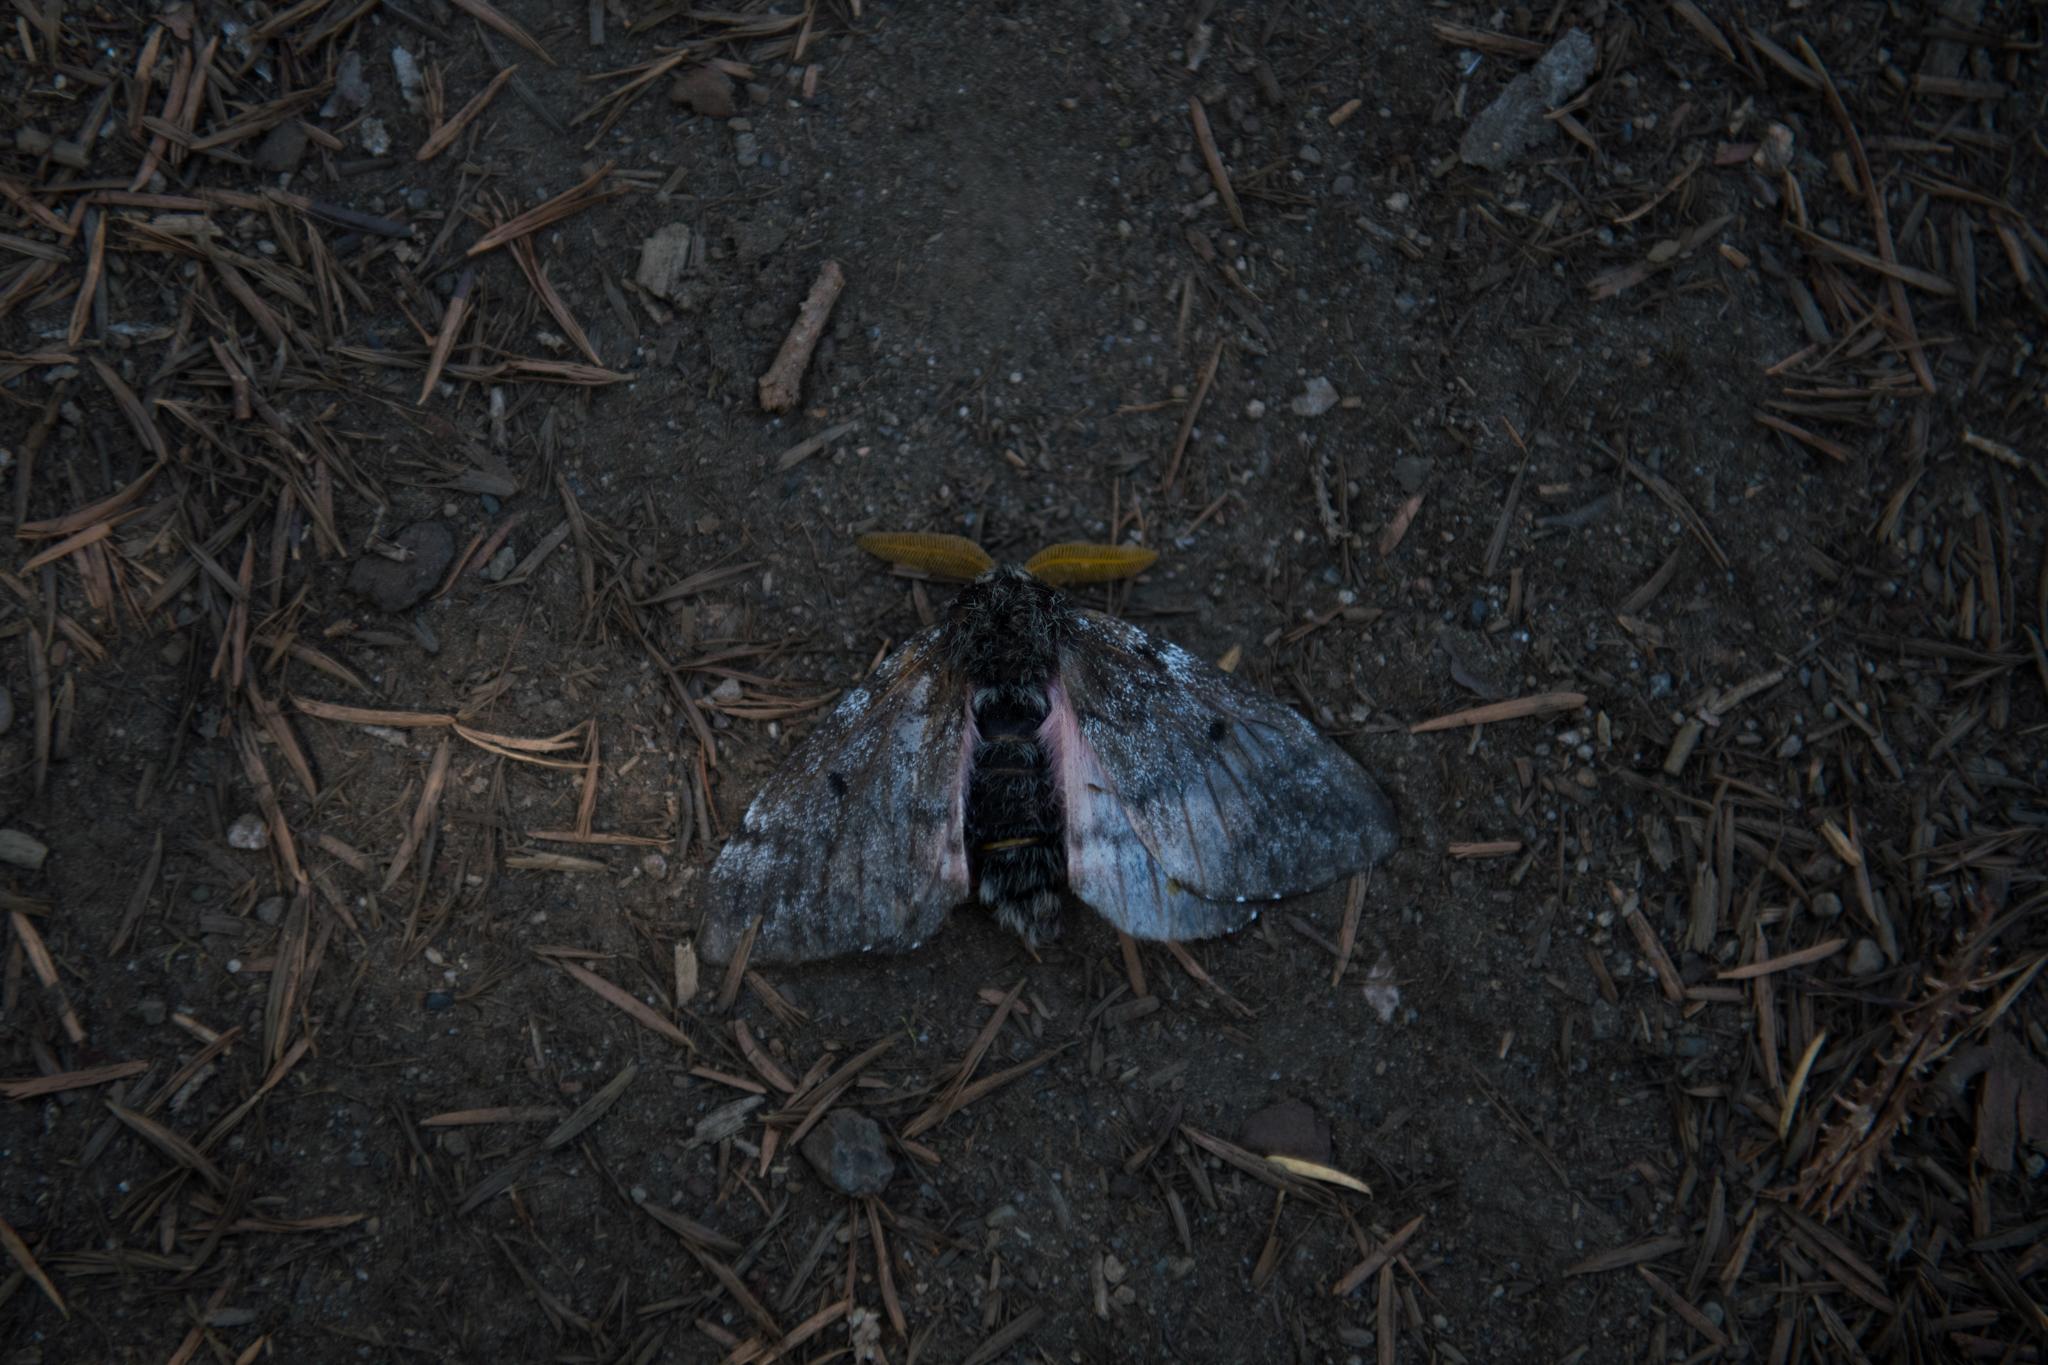 Pandora moths were in unexpected abundance  in Bend.